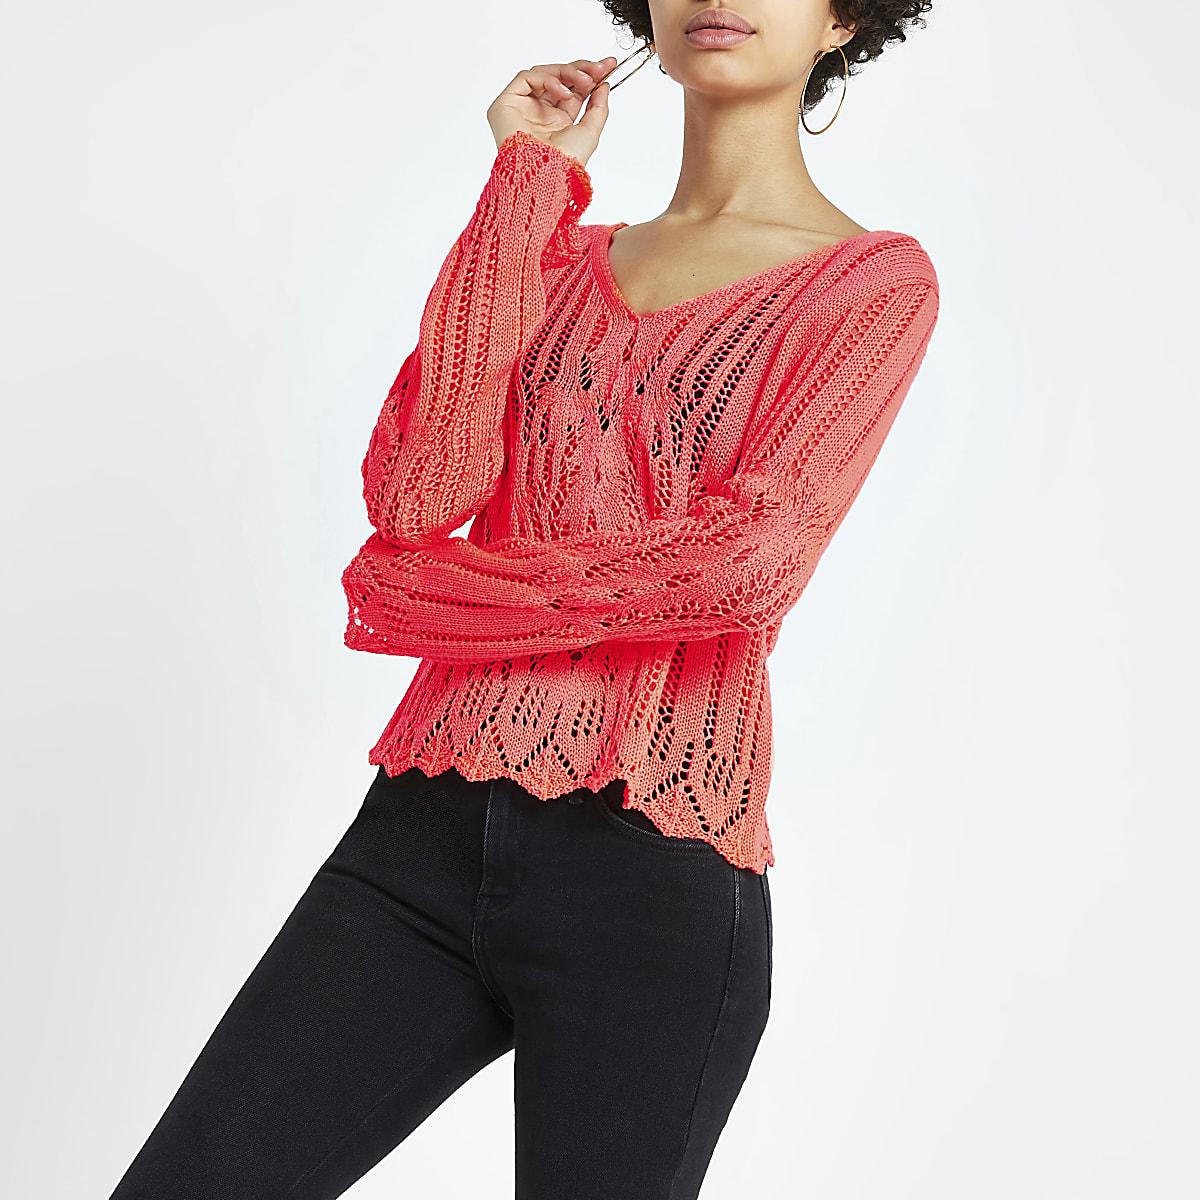 Pink knit crochet long sleeve top